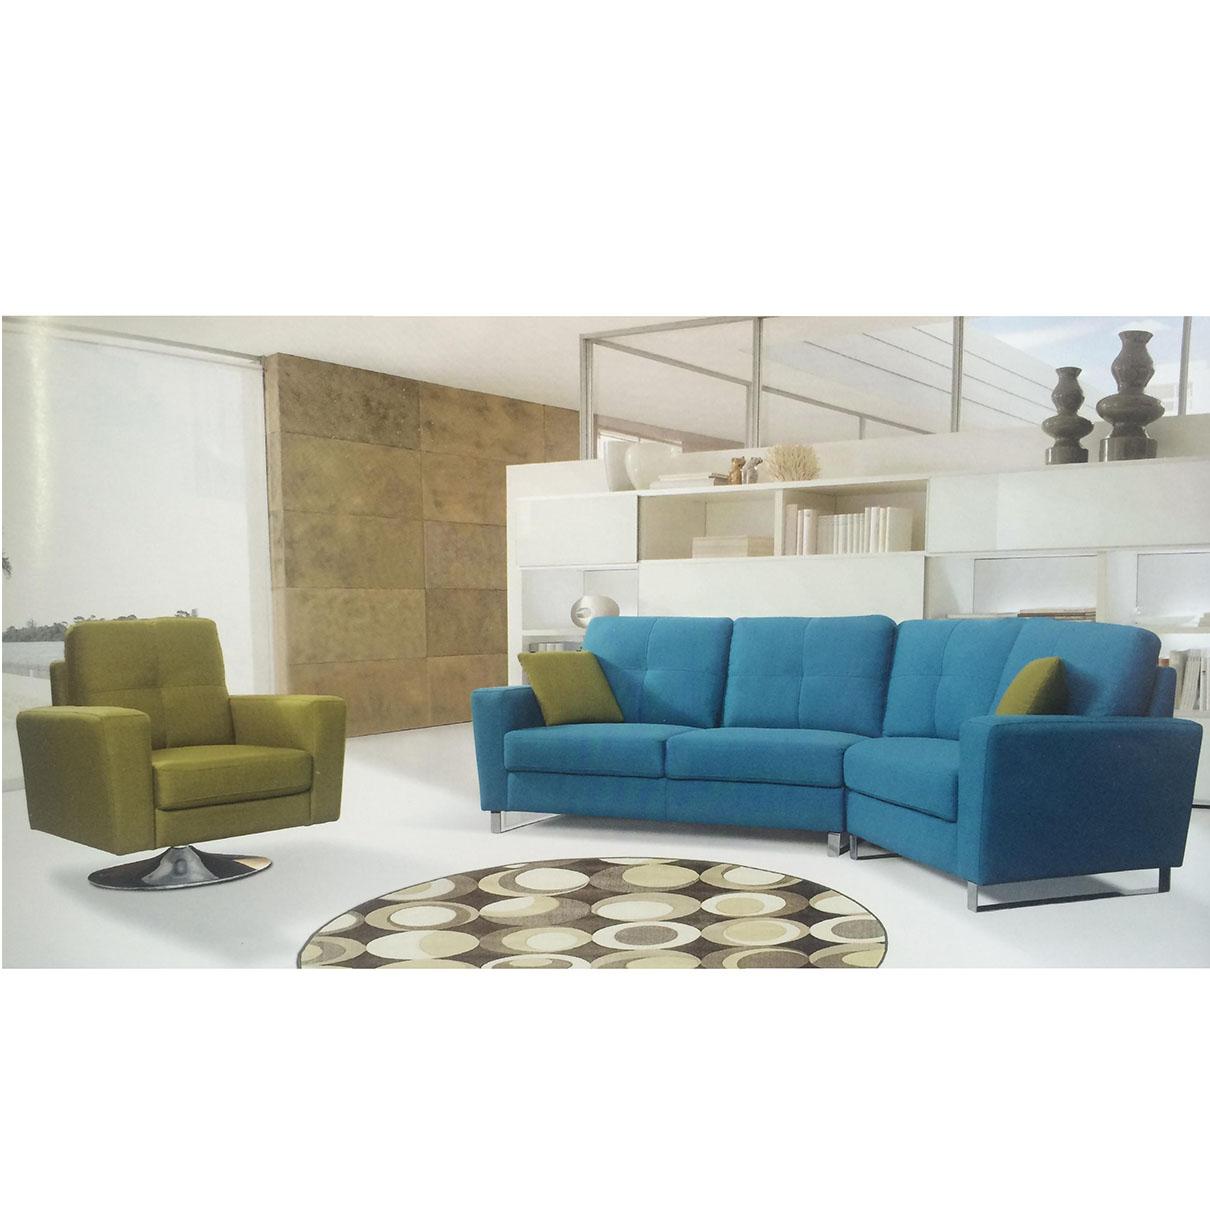 g12 decor and design lounge